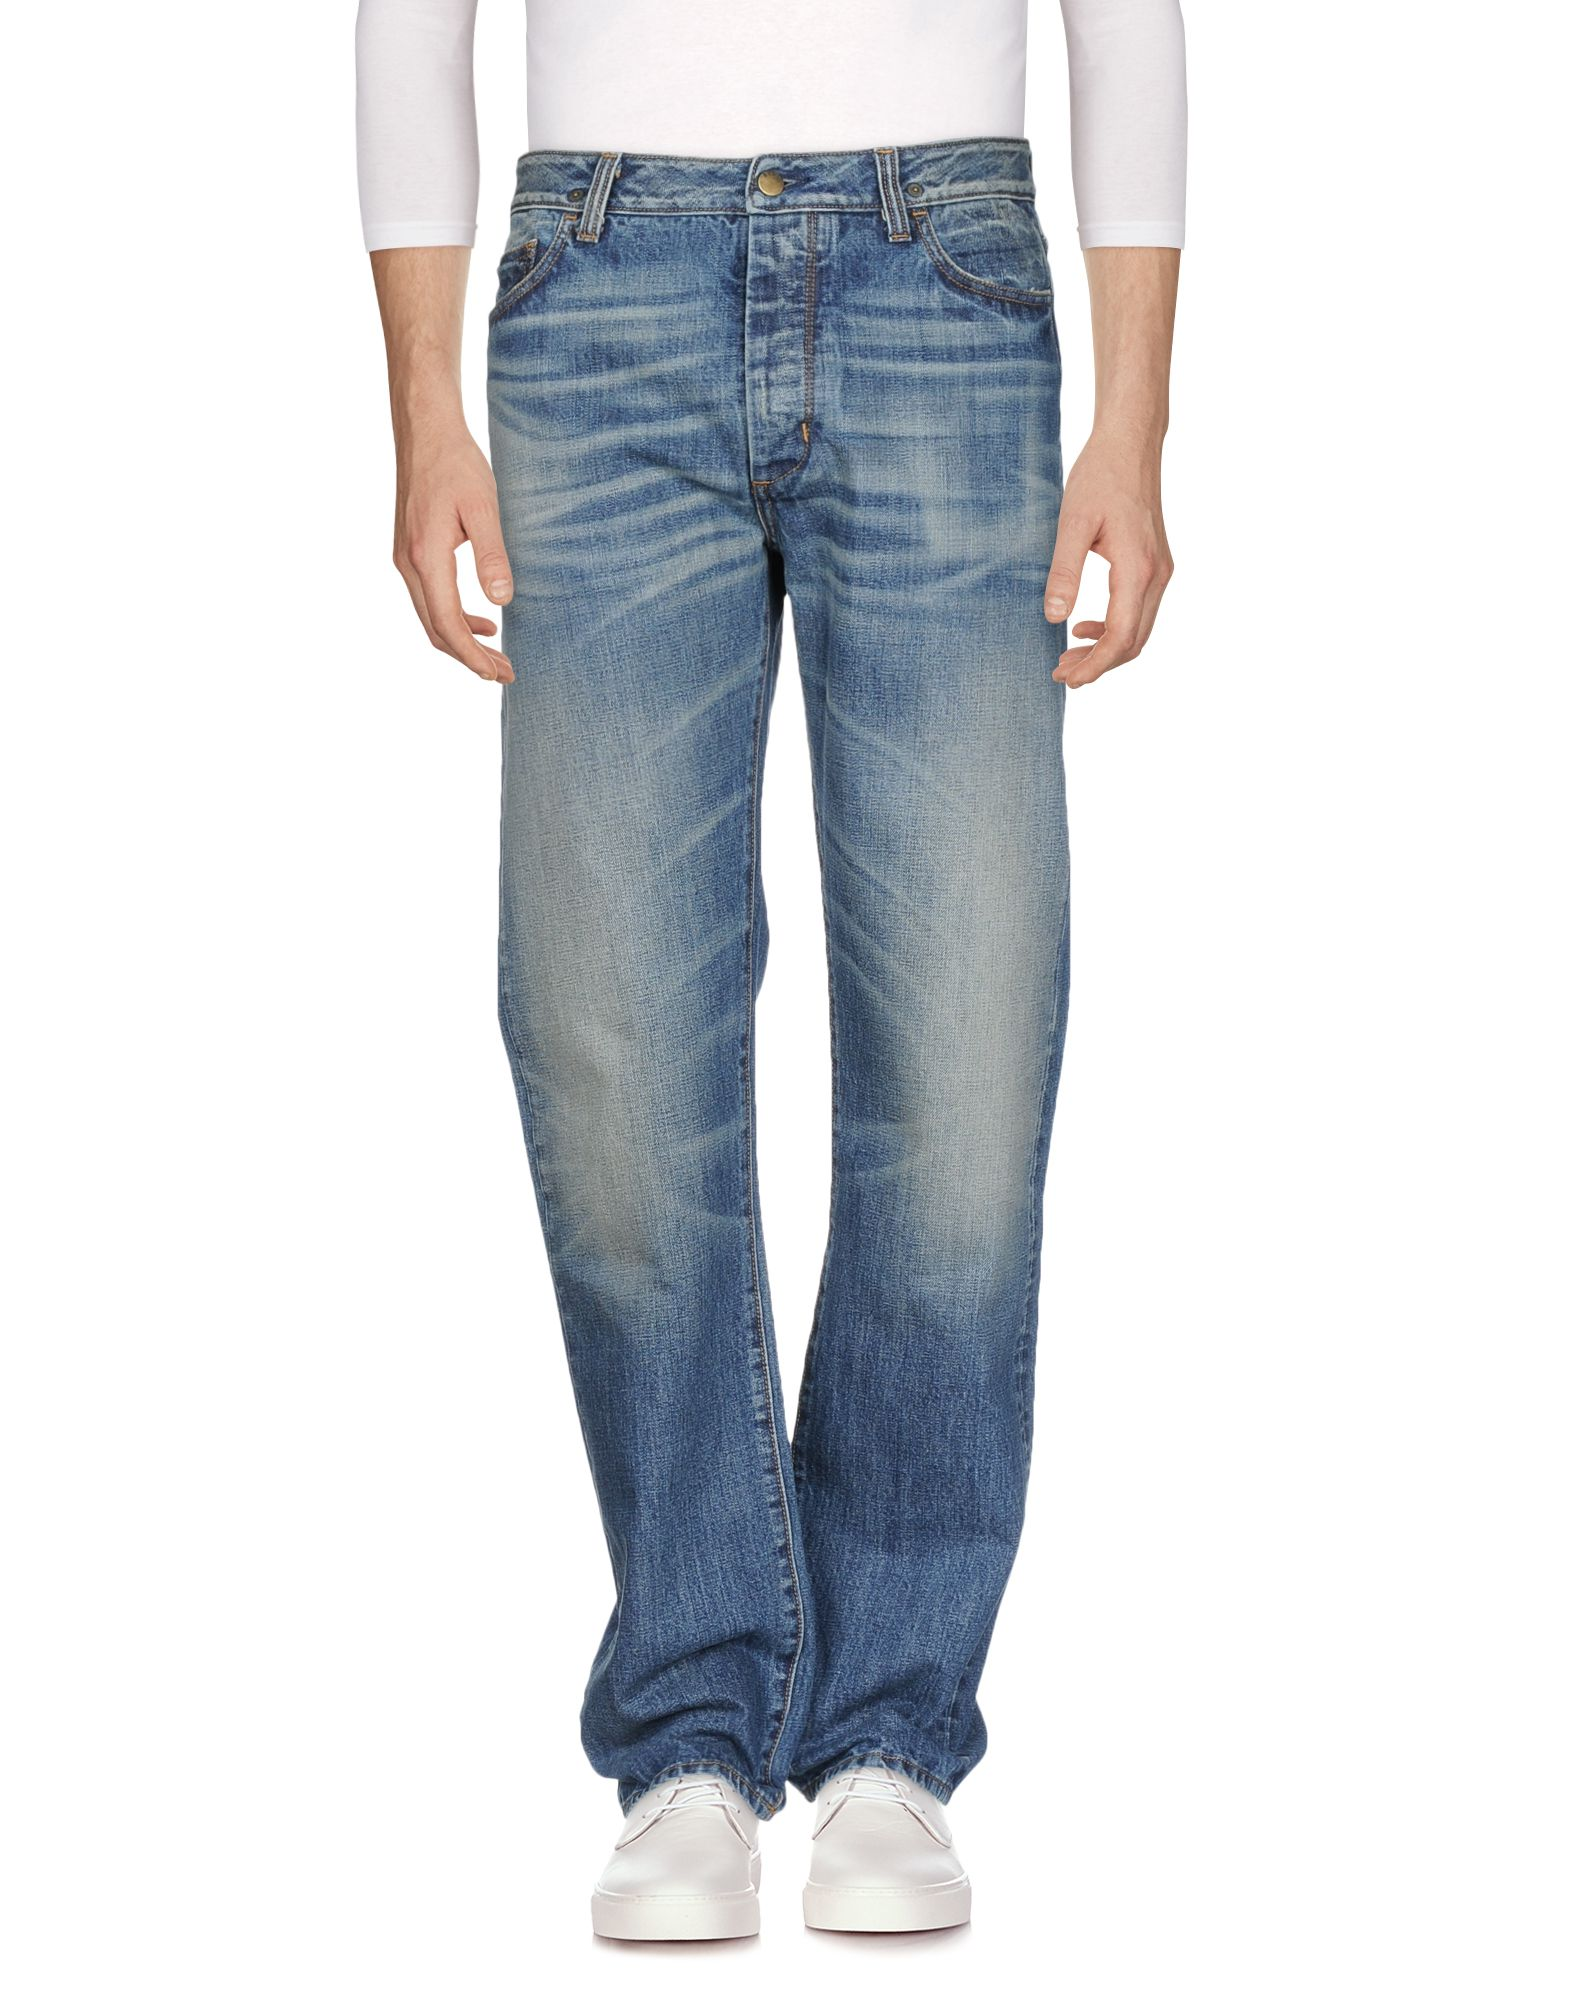 RING Denim Pants in Blue